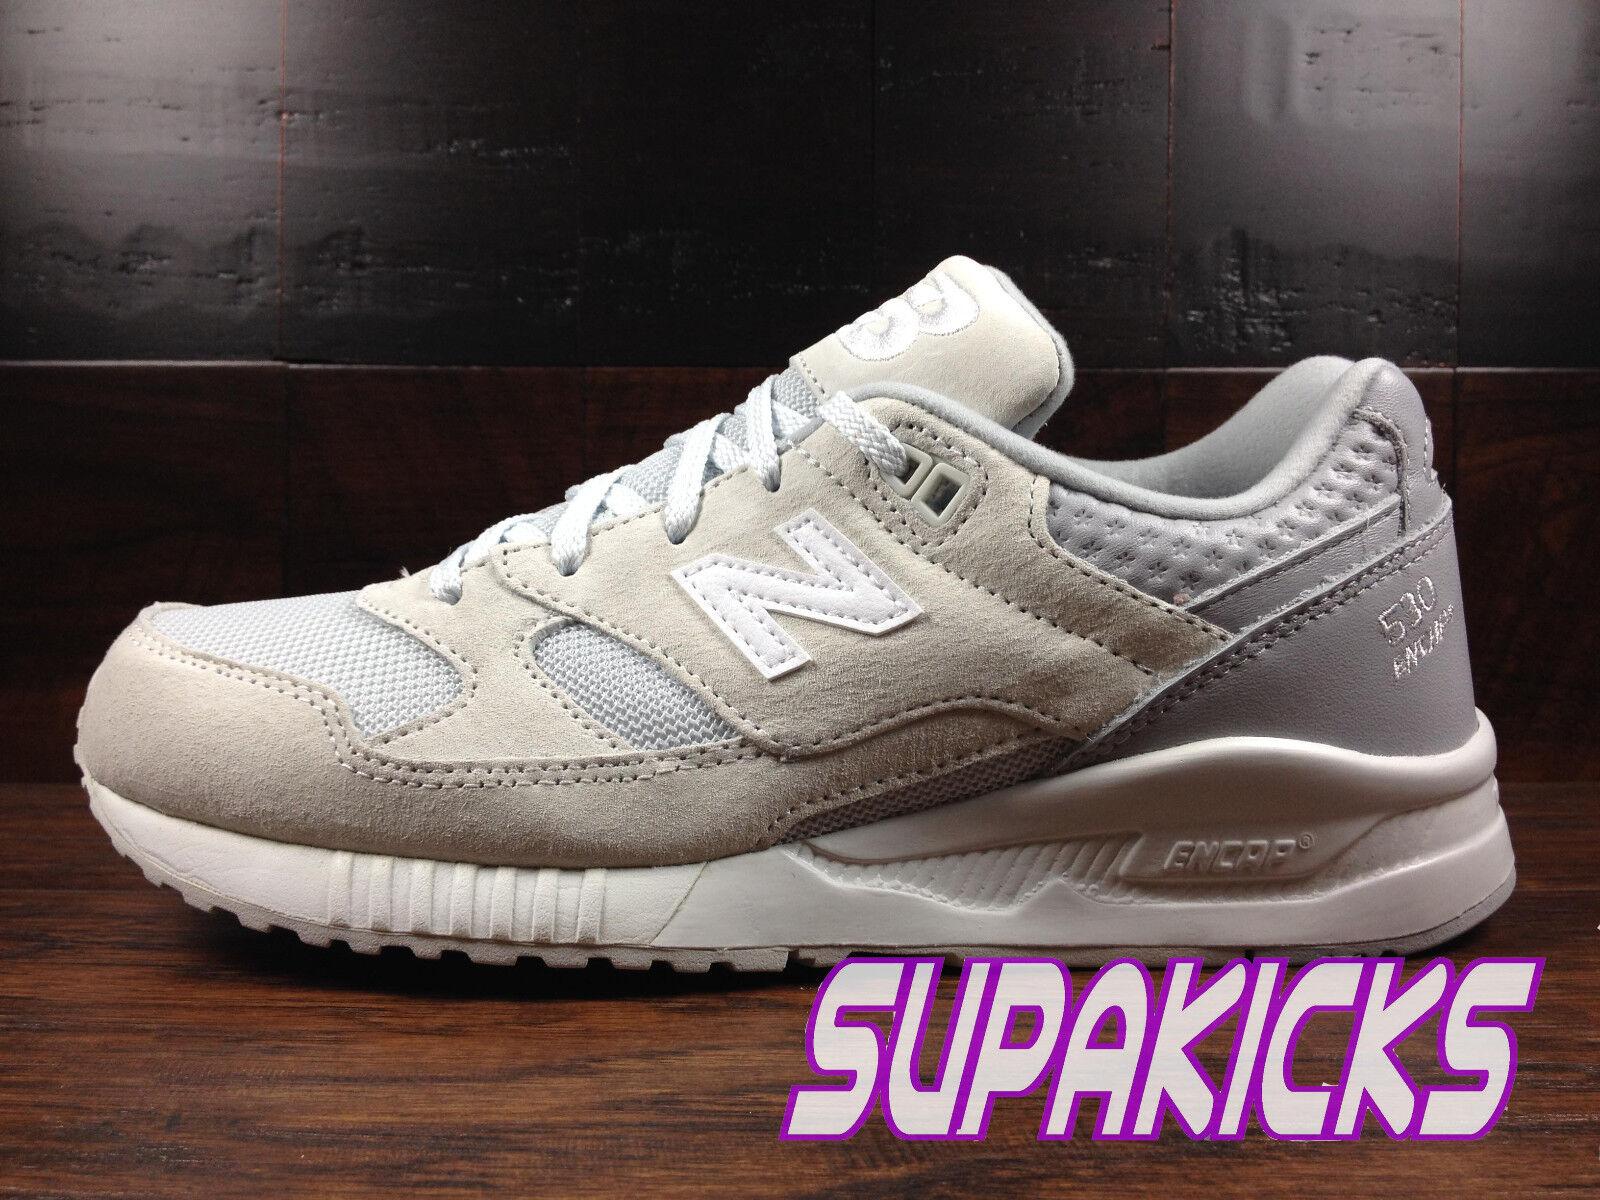 New Balance M530SPD (Light Grey / White) Gray Suede Lifestyle Classic 530 Mens